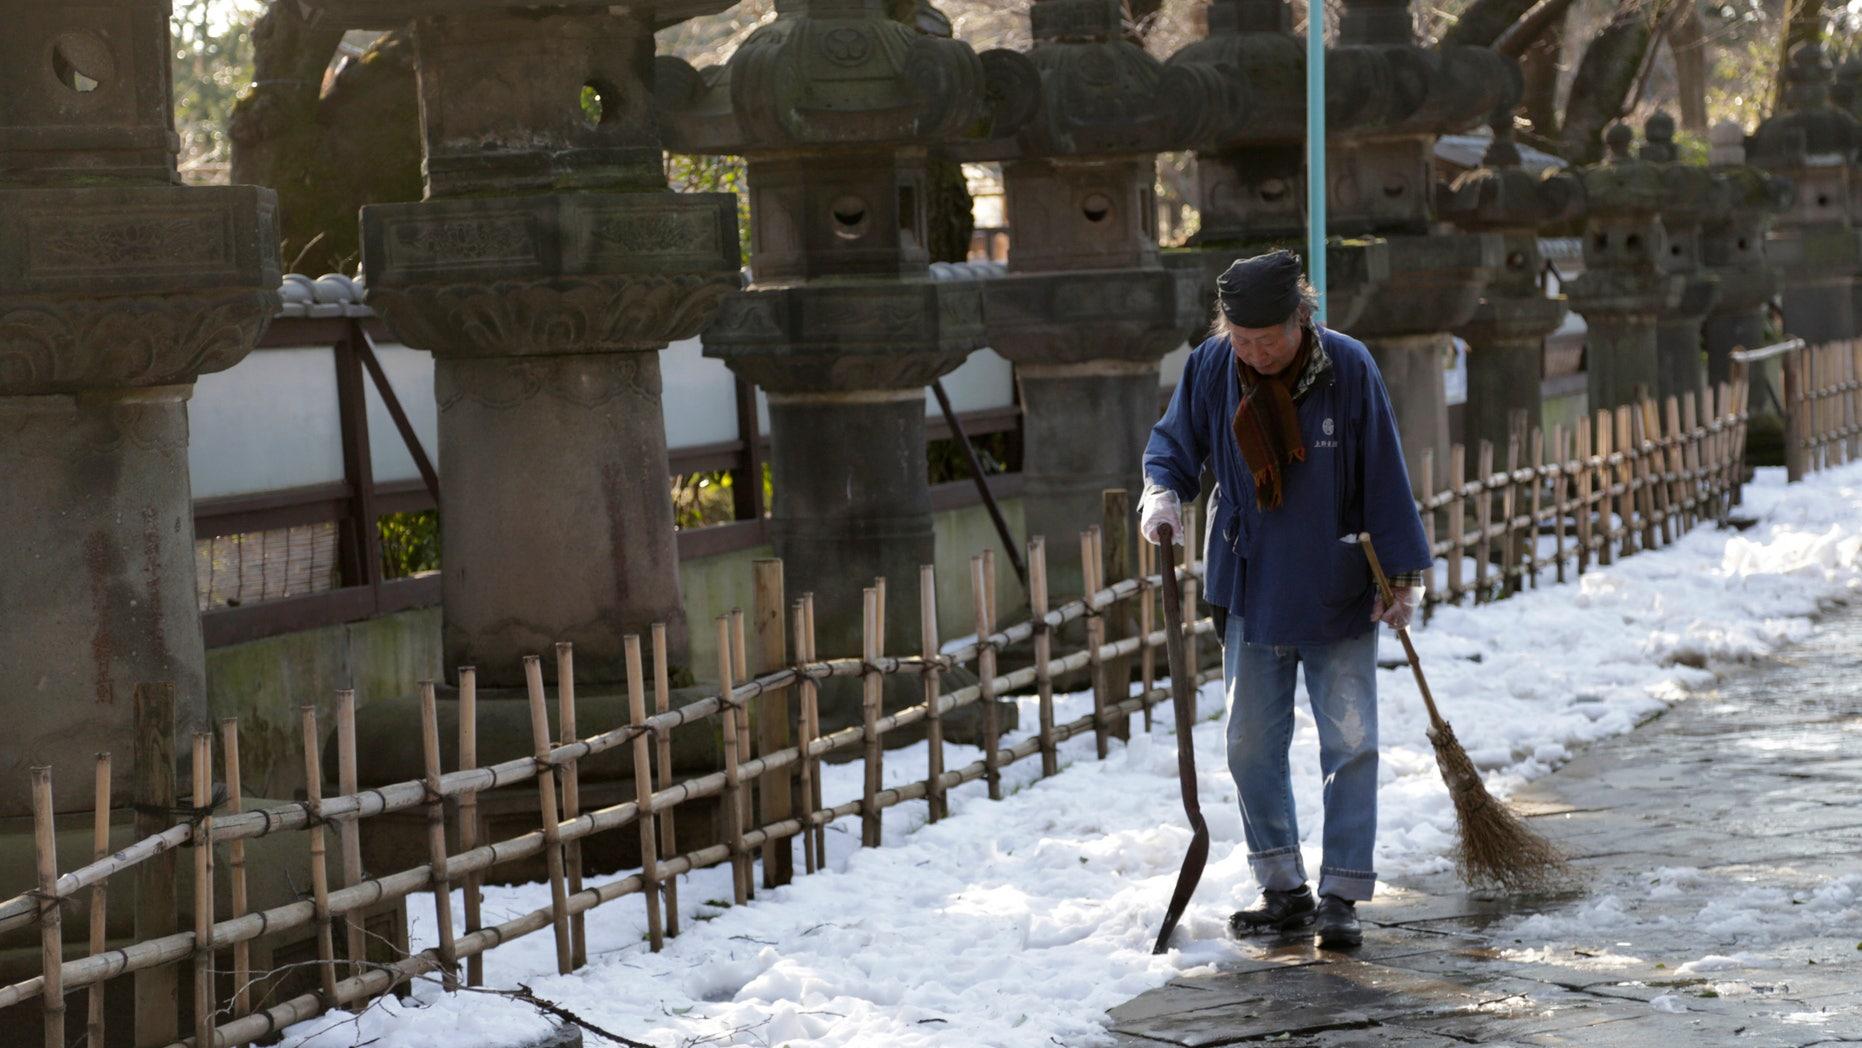 A worker walks away after shoveling snow off a court yard at a temple in Tokyo, Sunday, Feb. 16, 2014. (AP Photo/Shizuo Kambayashi)